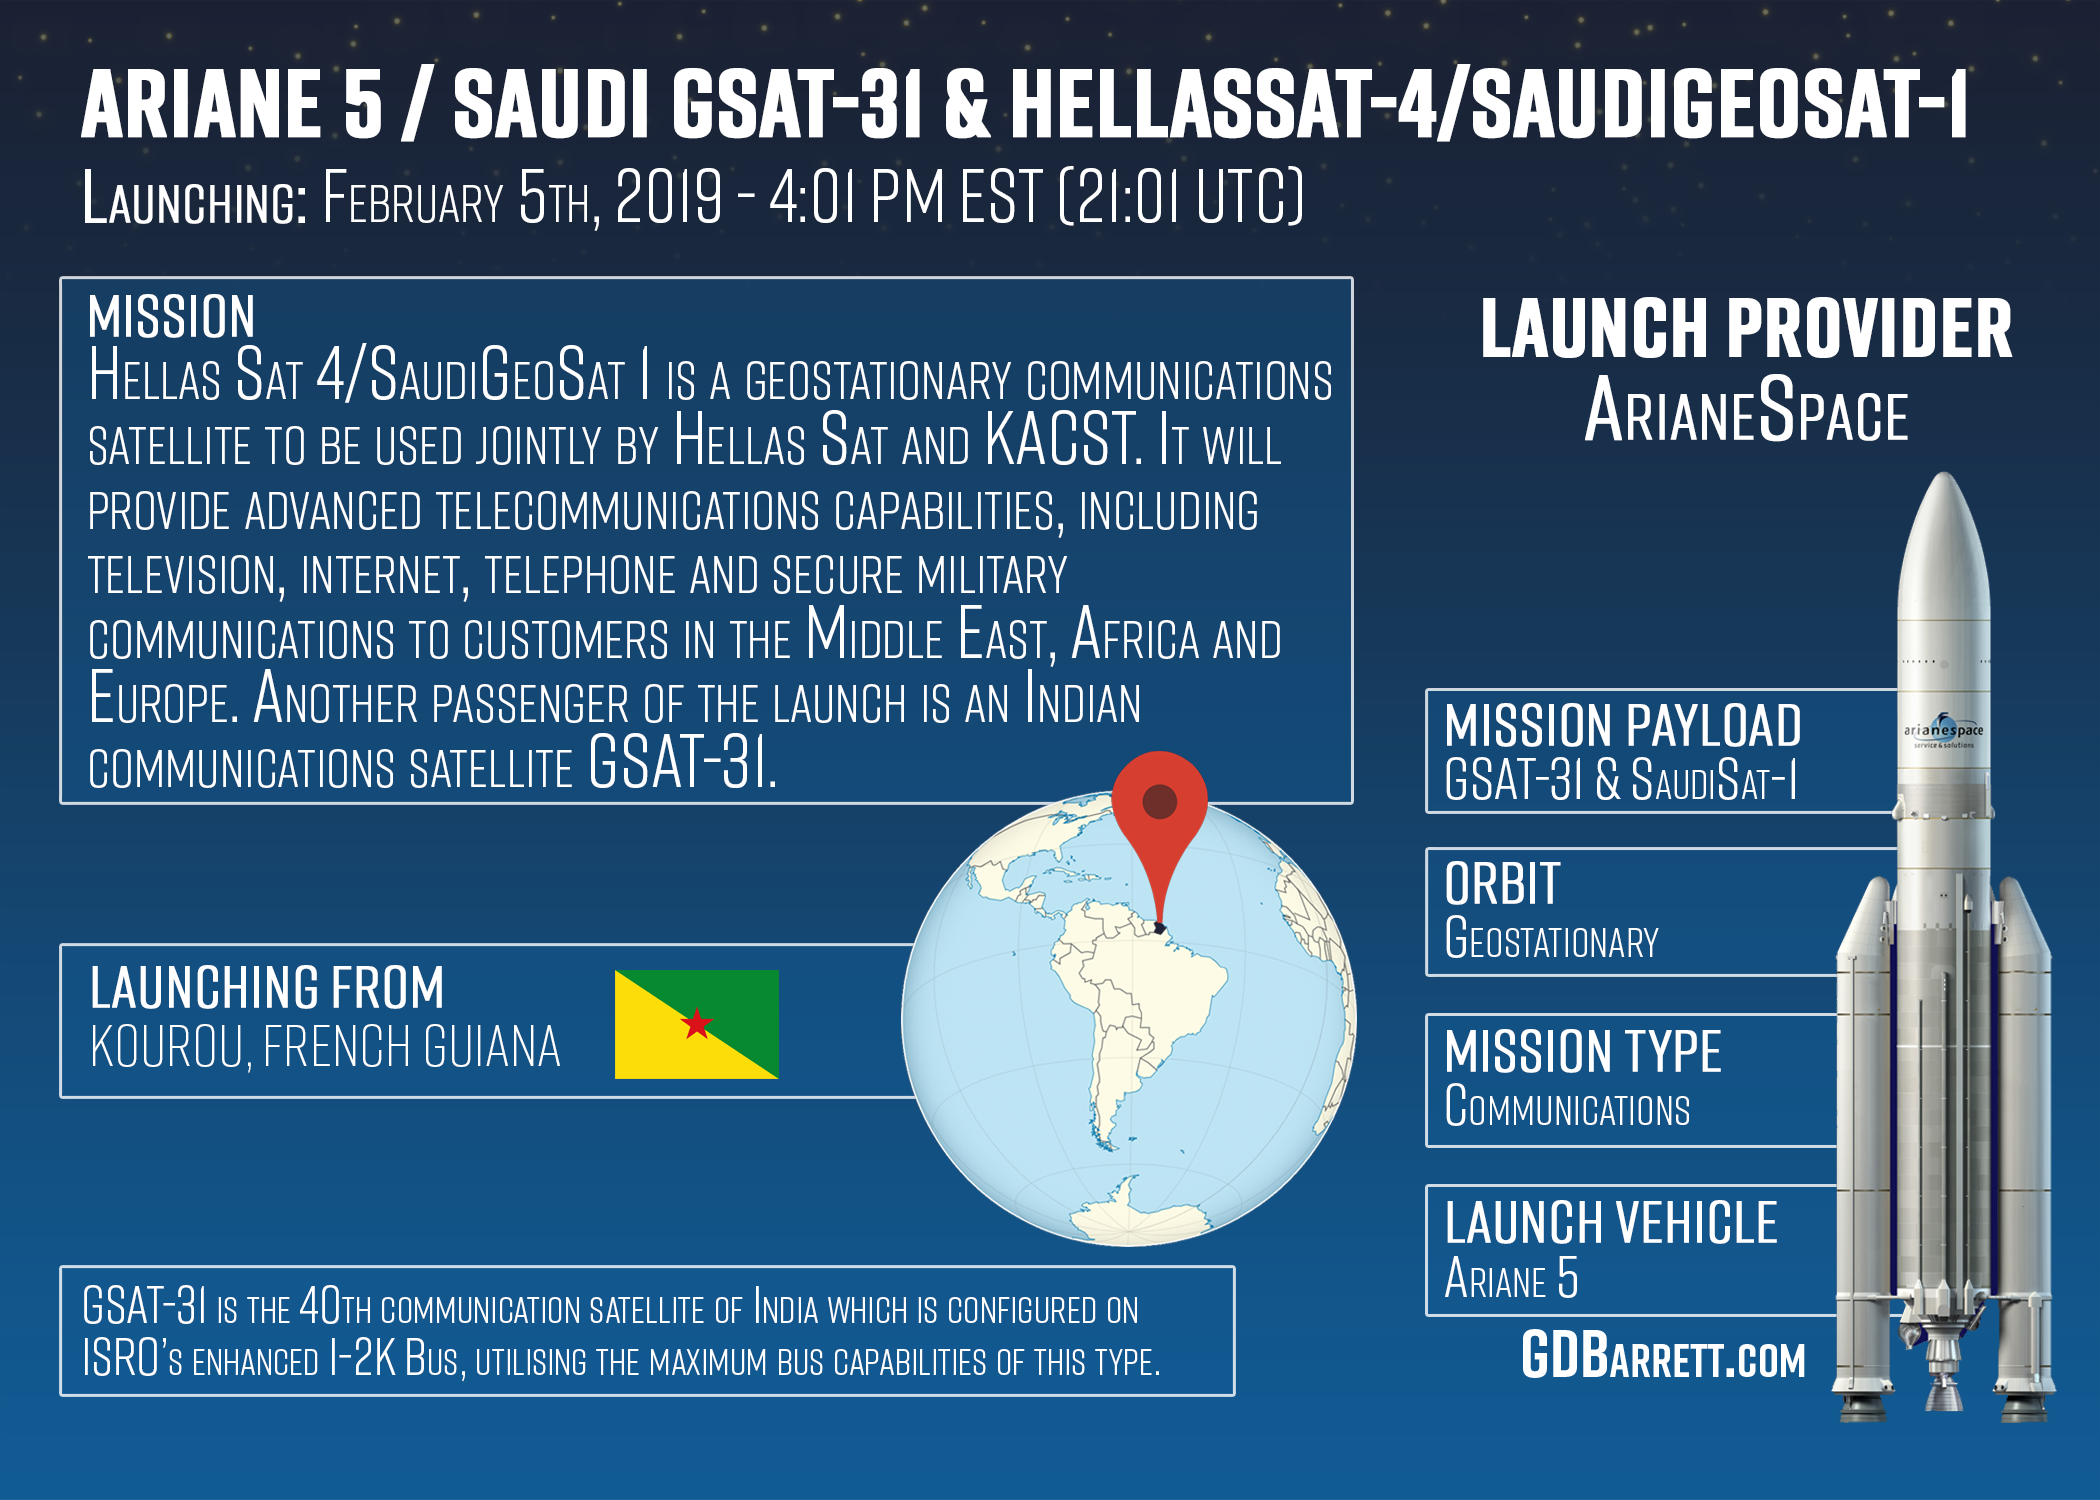 Ariane 5 / Saudi GSat-3 HellasSat-4 SaudiGeoSat-1